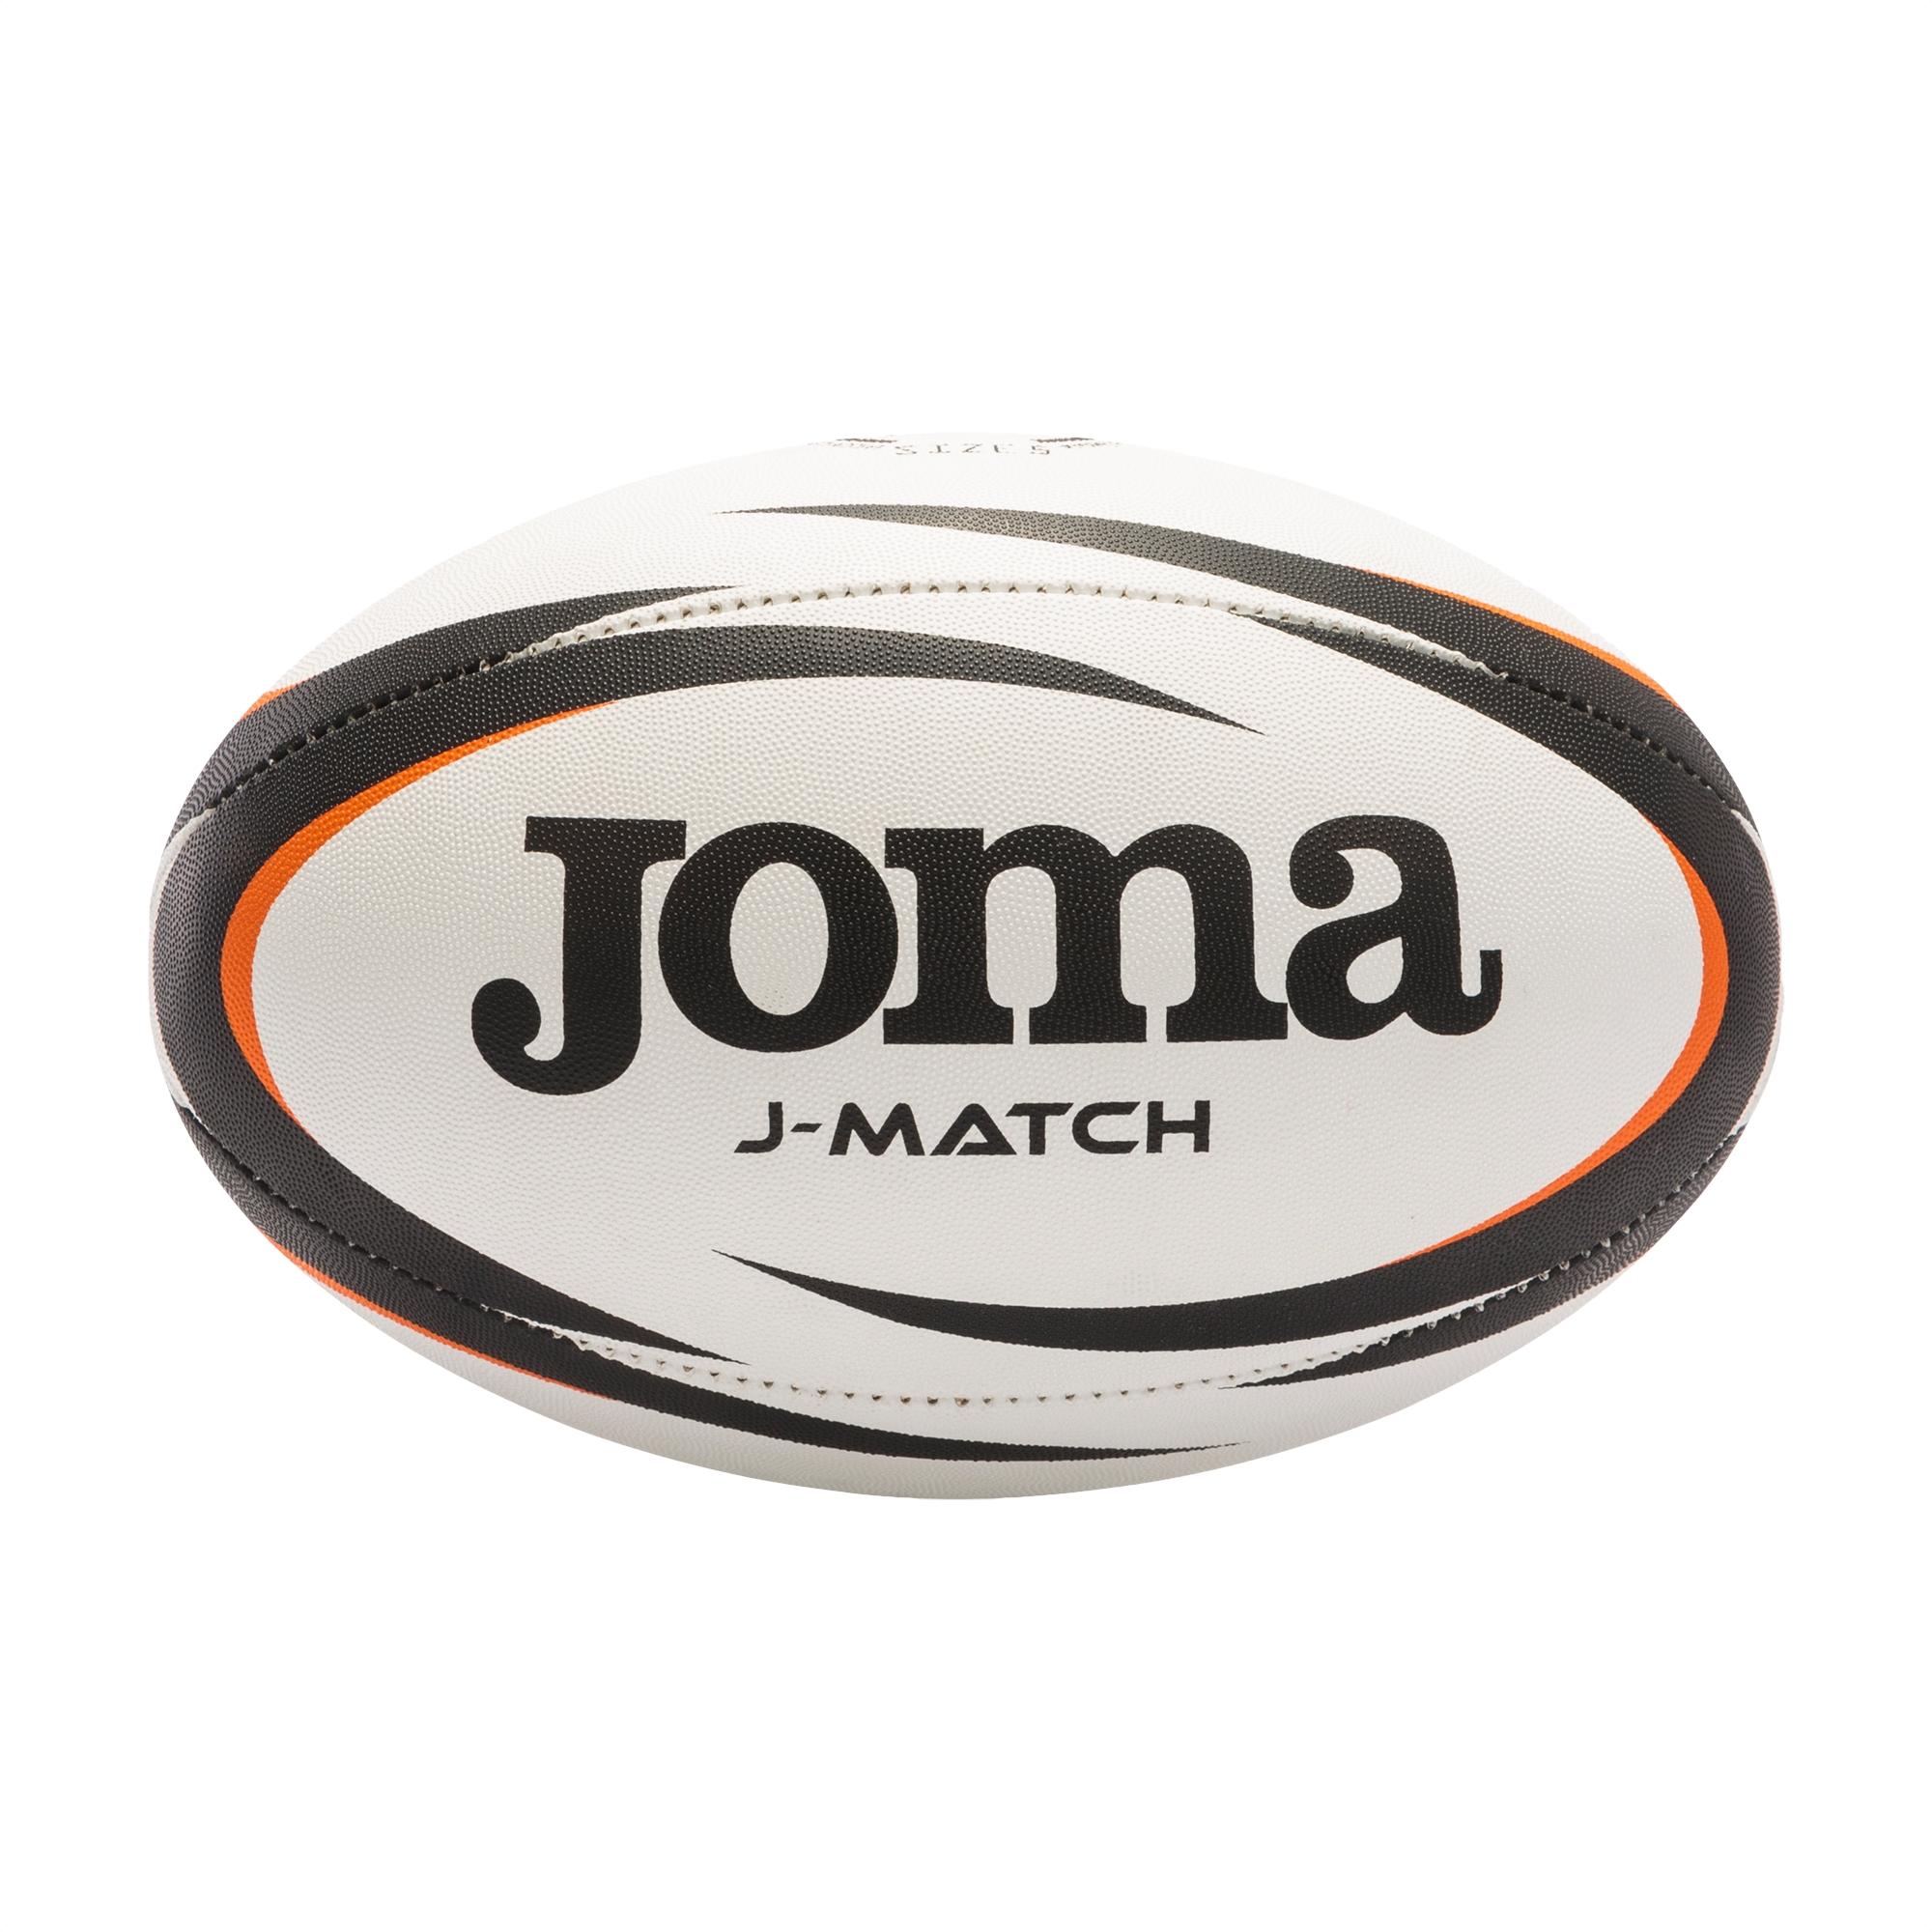 Minge de rugby Joma J-Match, Marime 5